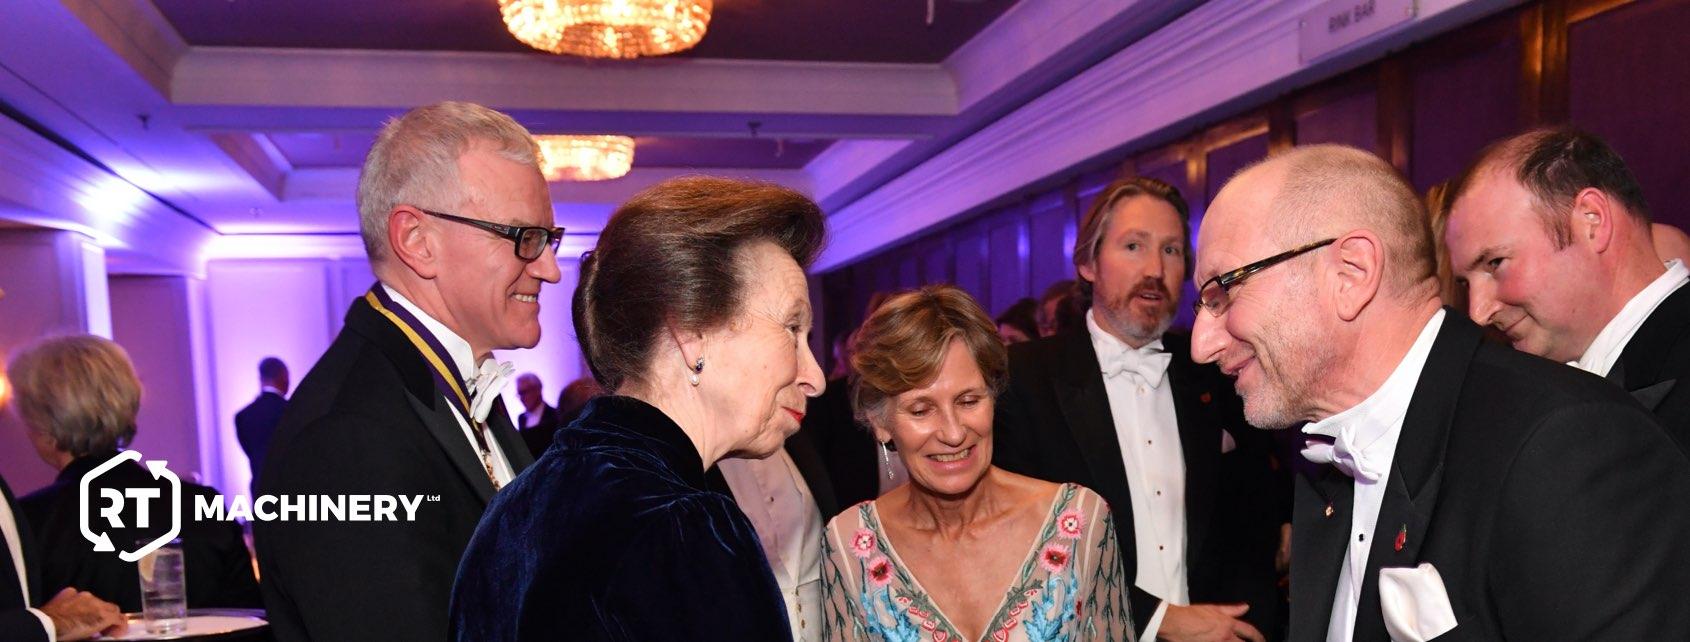 Richard Taylor meets Princess Anne